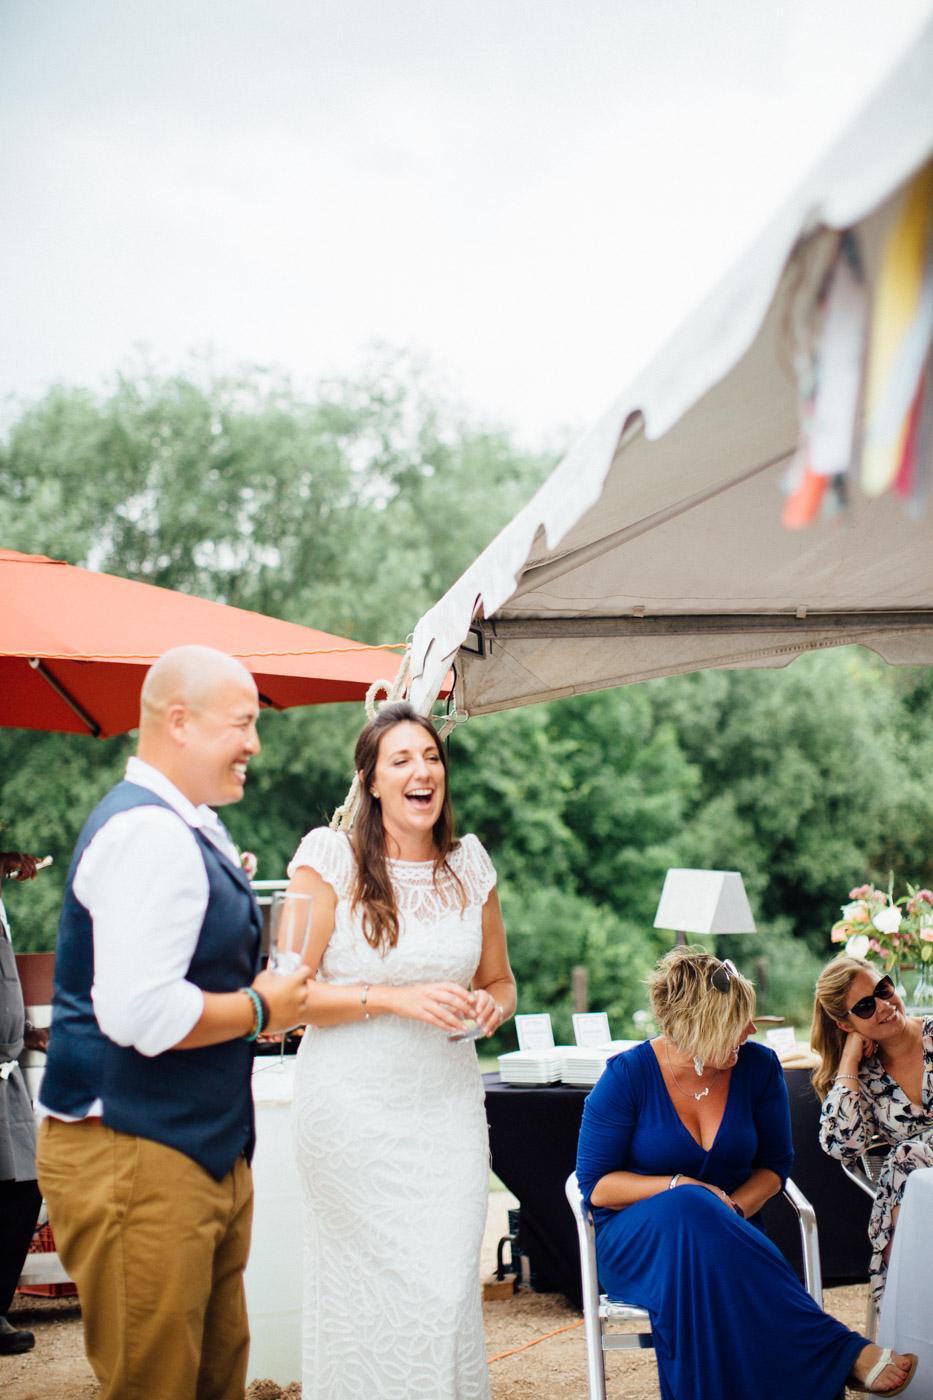 Thera & Barry Wedding 2016-611.jpg